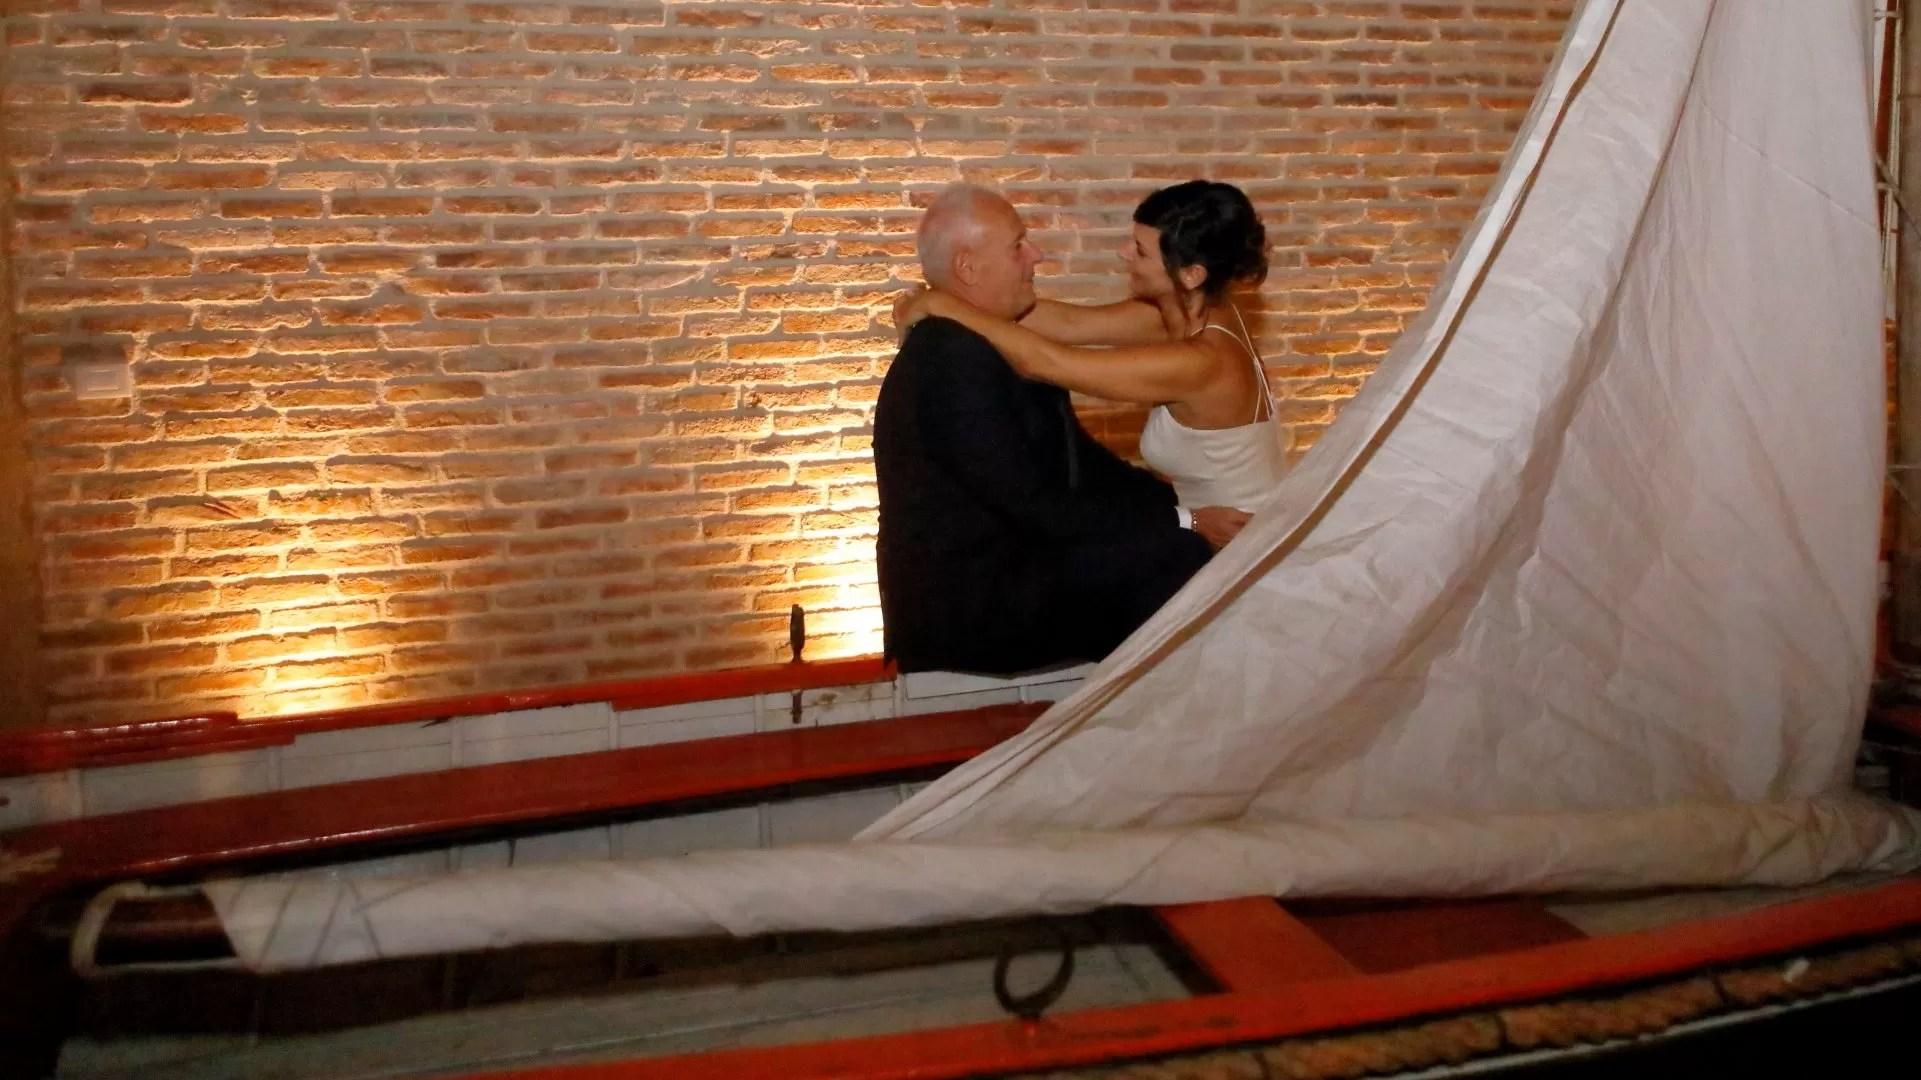 matrimoni-lago-di-garda-wedding-planner-fotografi-desenzano-del-garda-peschiera-del garda-federici-marco-fotografo